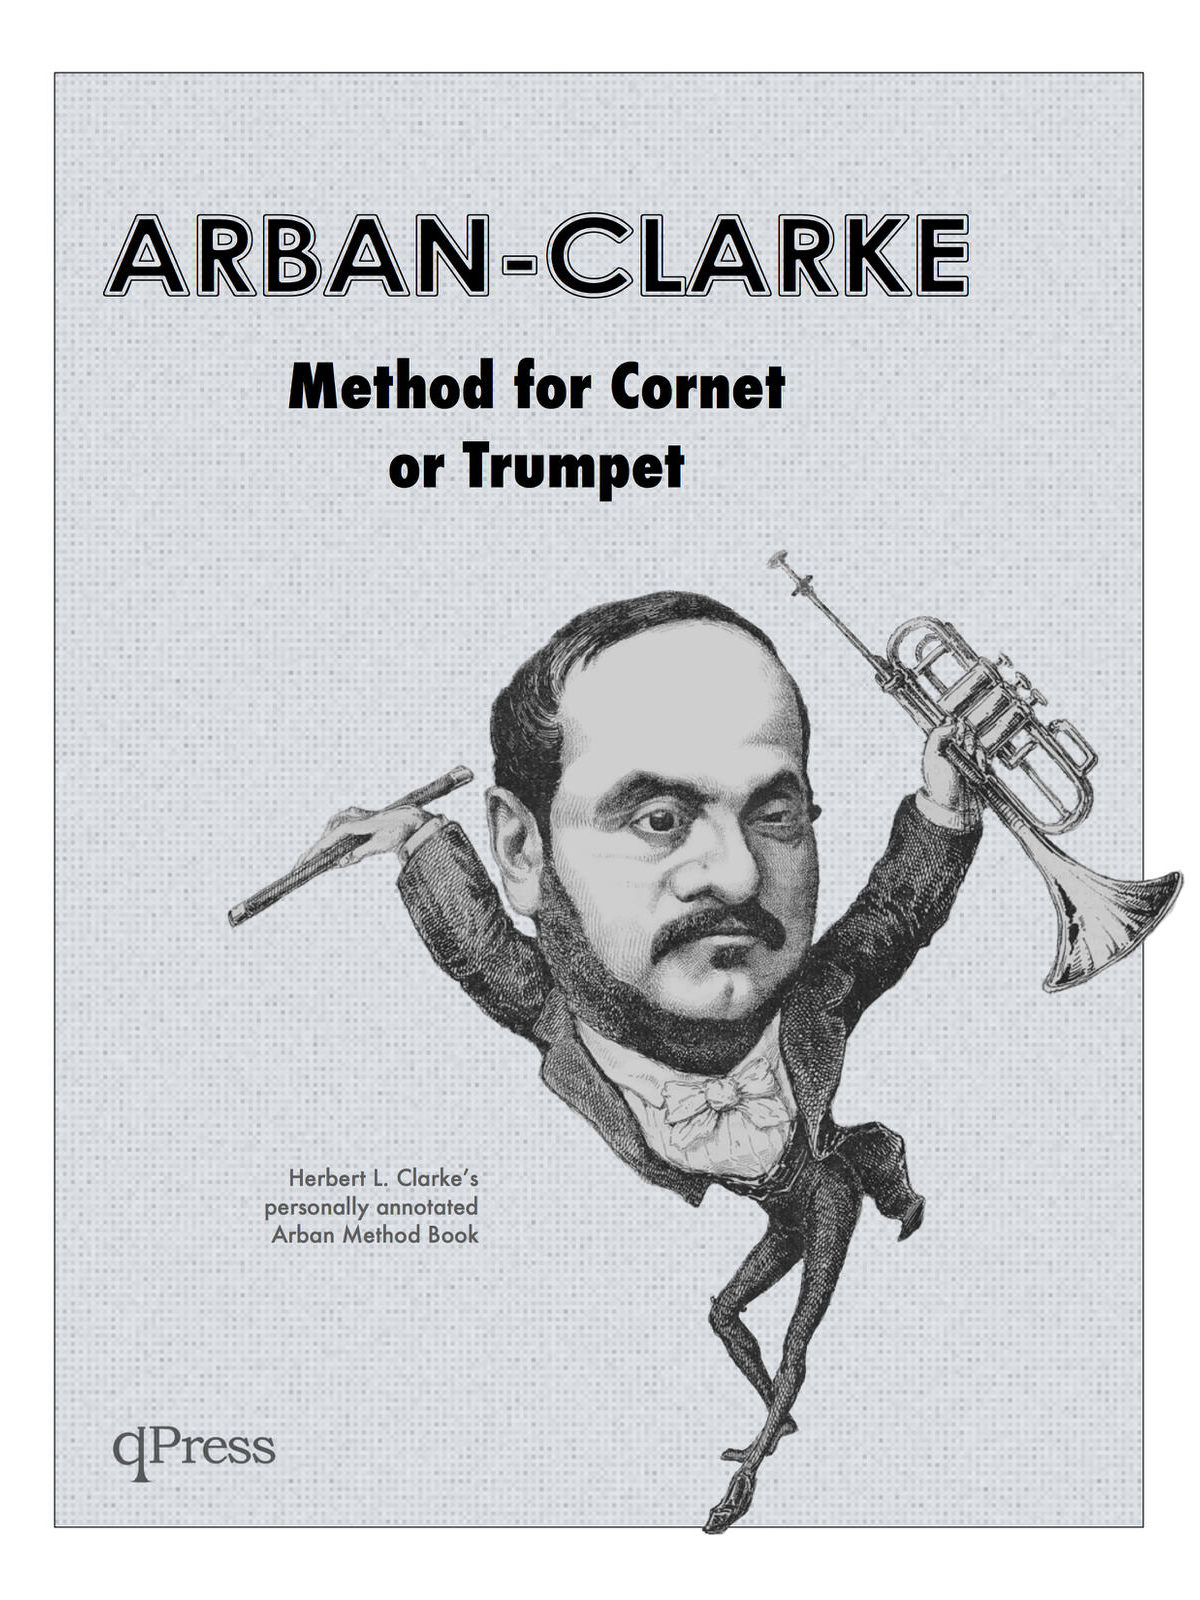 Arban-Clarke, Method for Cornet and Trumpet